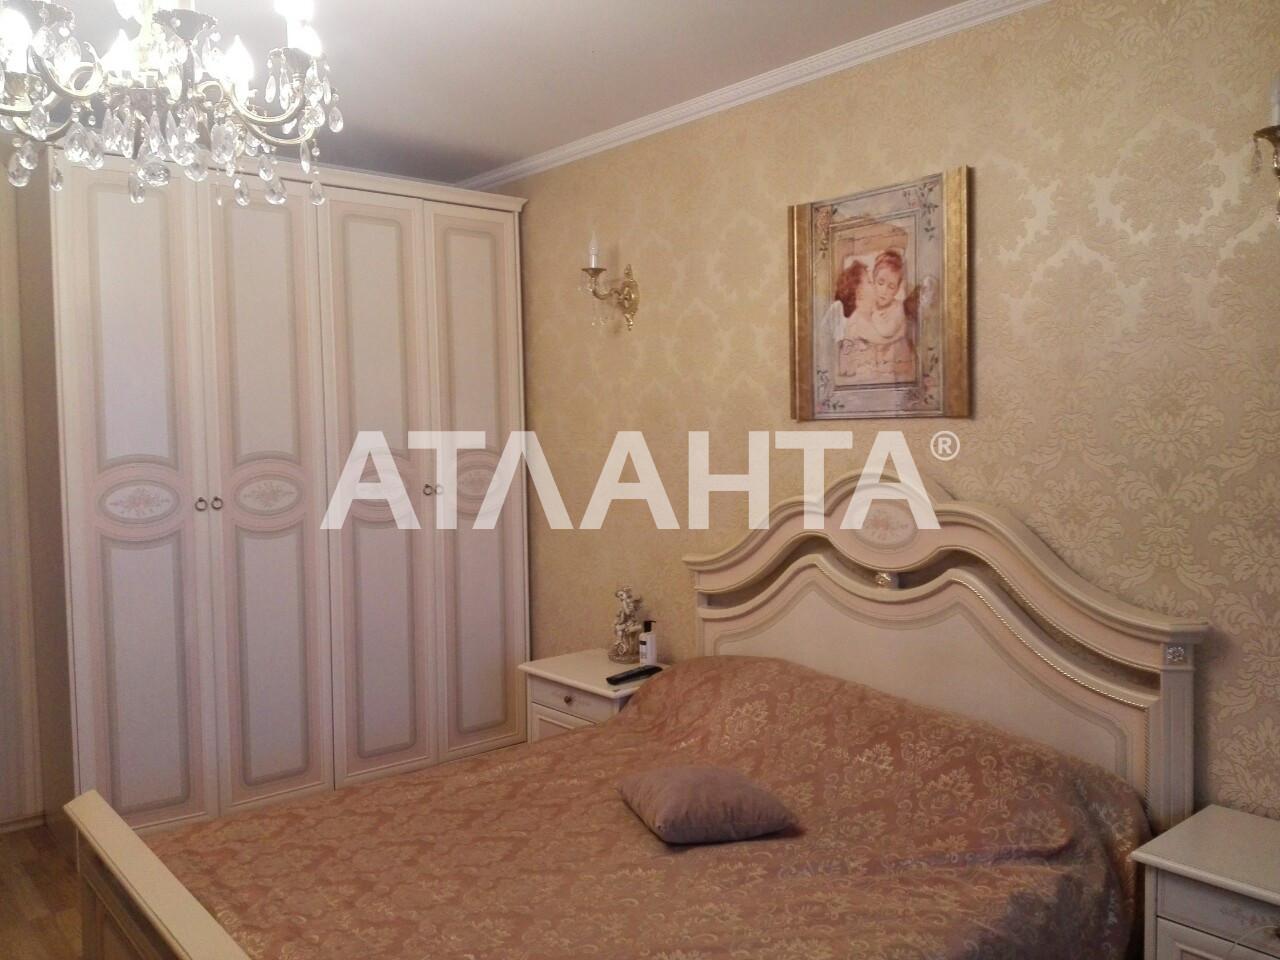 Продается 3-комнатная Квартира на ул. Бабаджаняна Марш. (Рекордная) — 100 000 у.е. (фото №5)